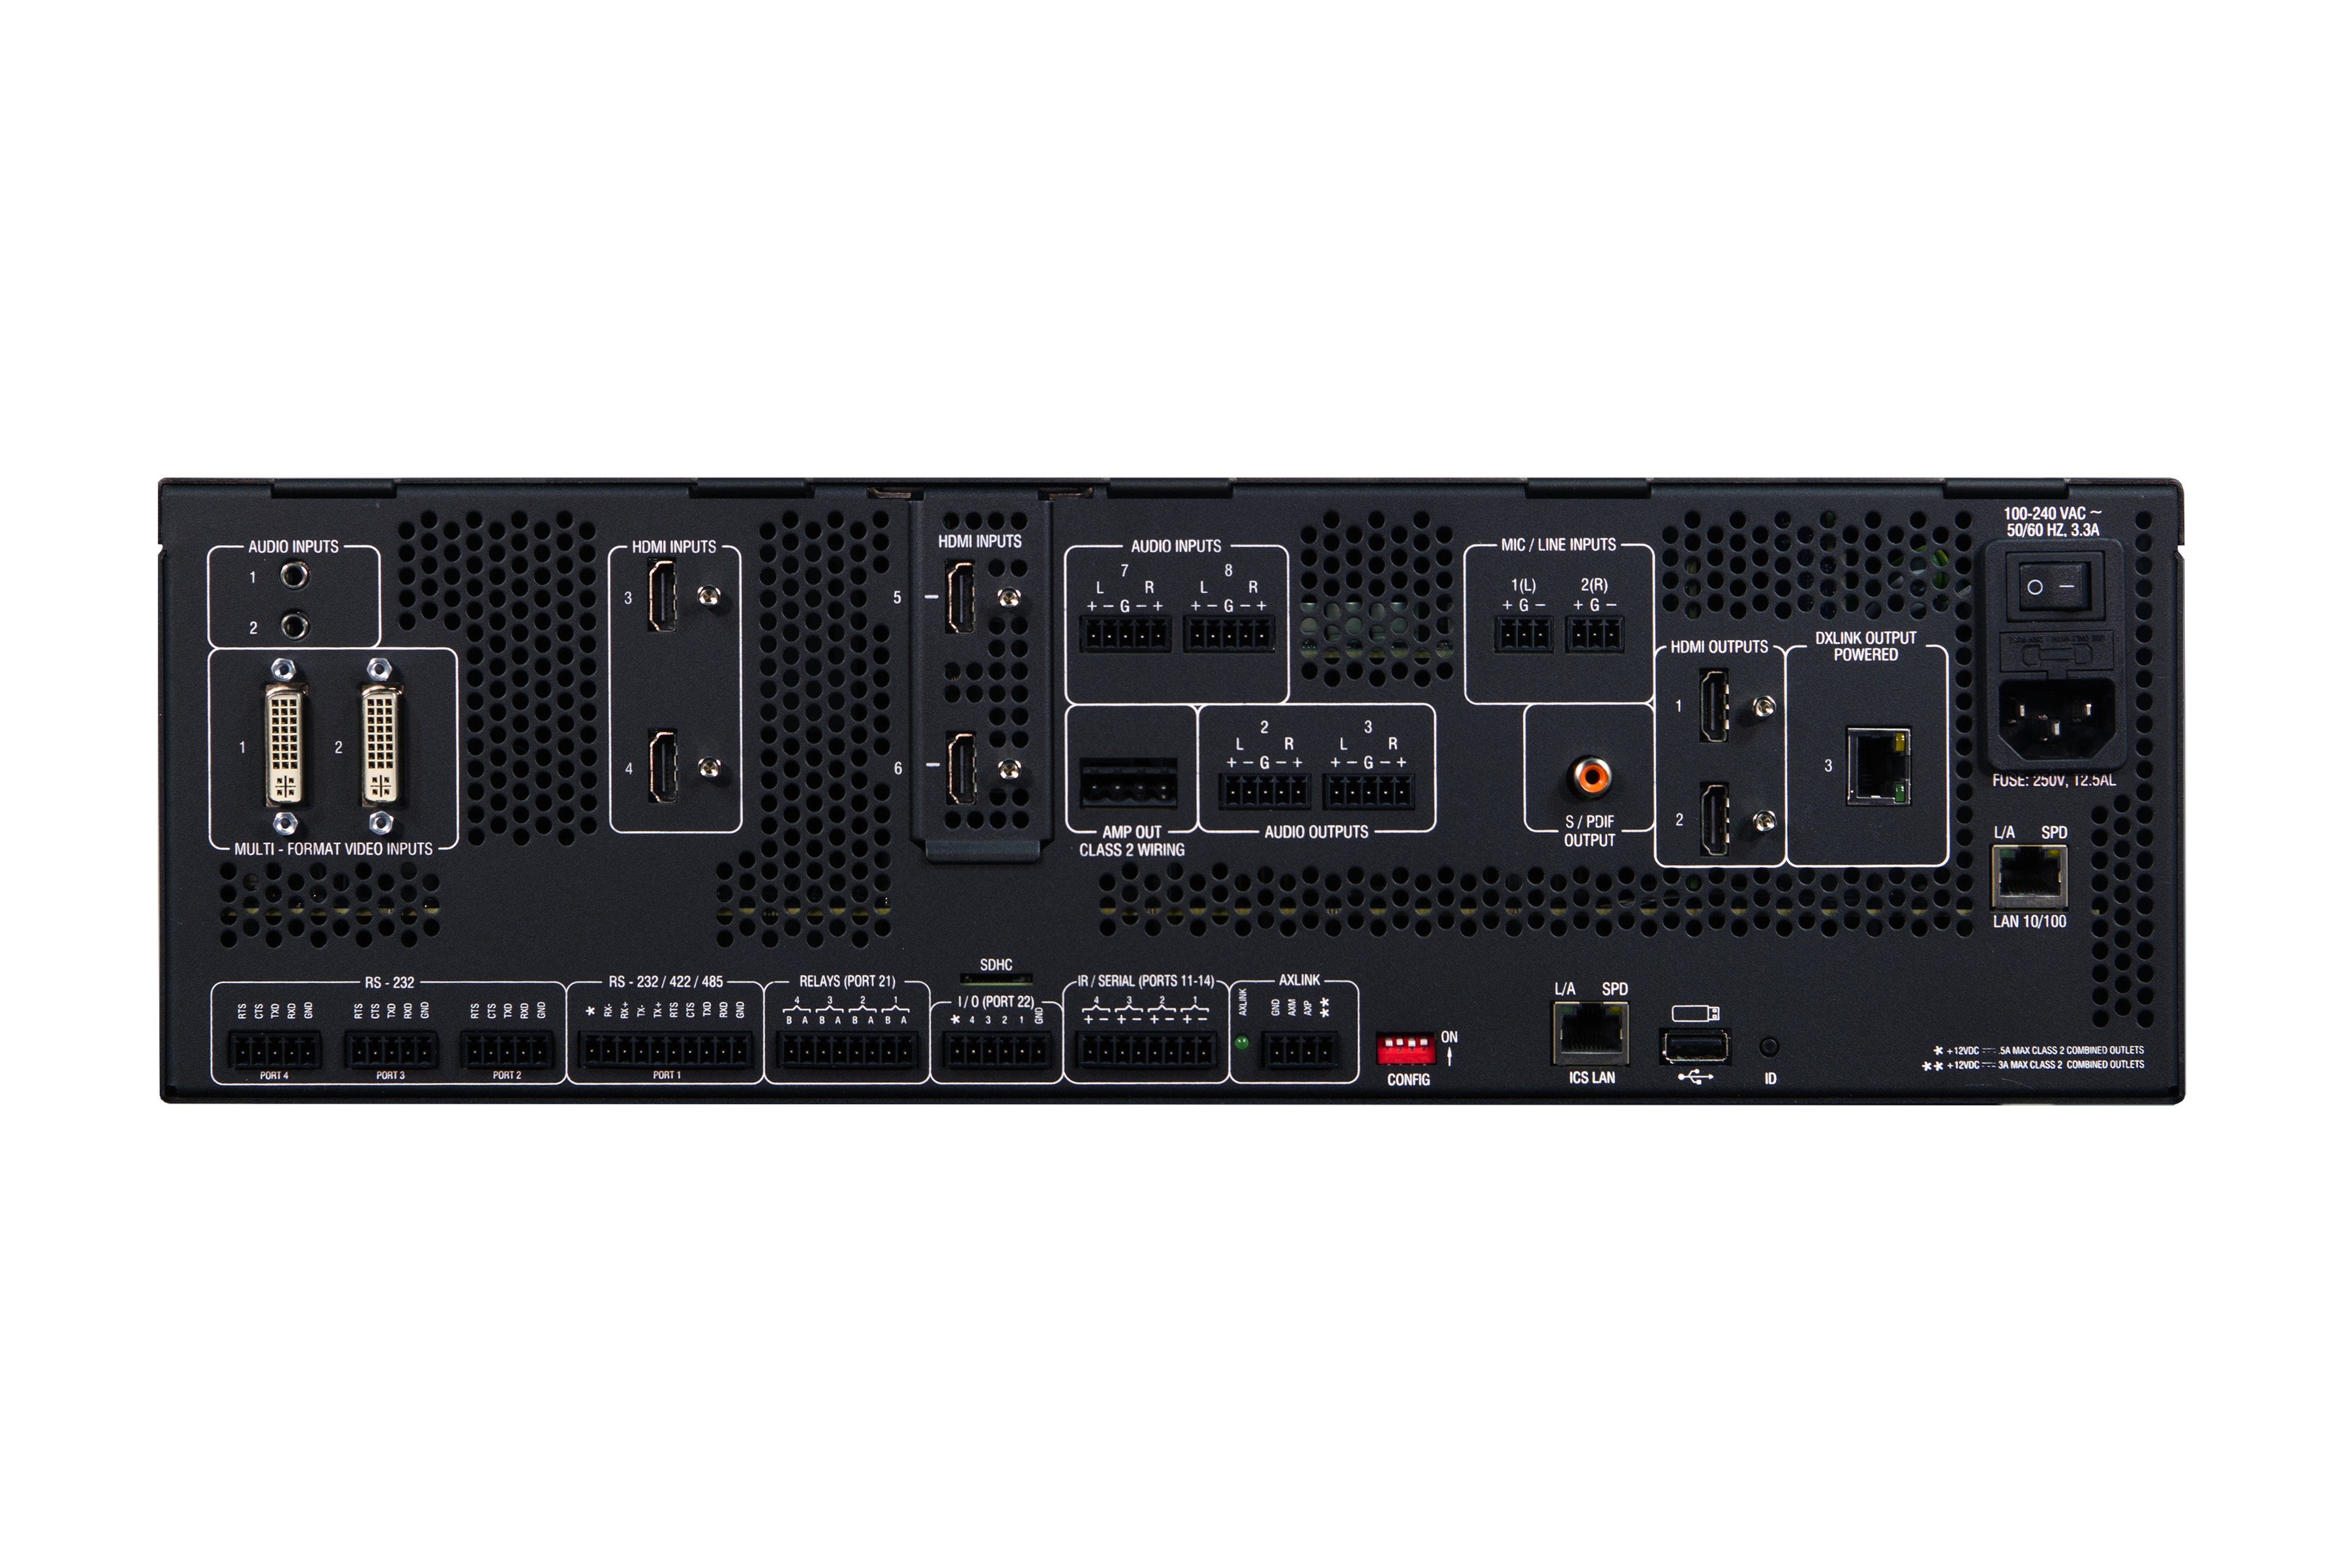 DVX-2250HD-SP - Rear